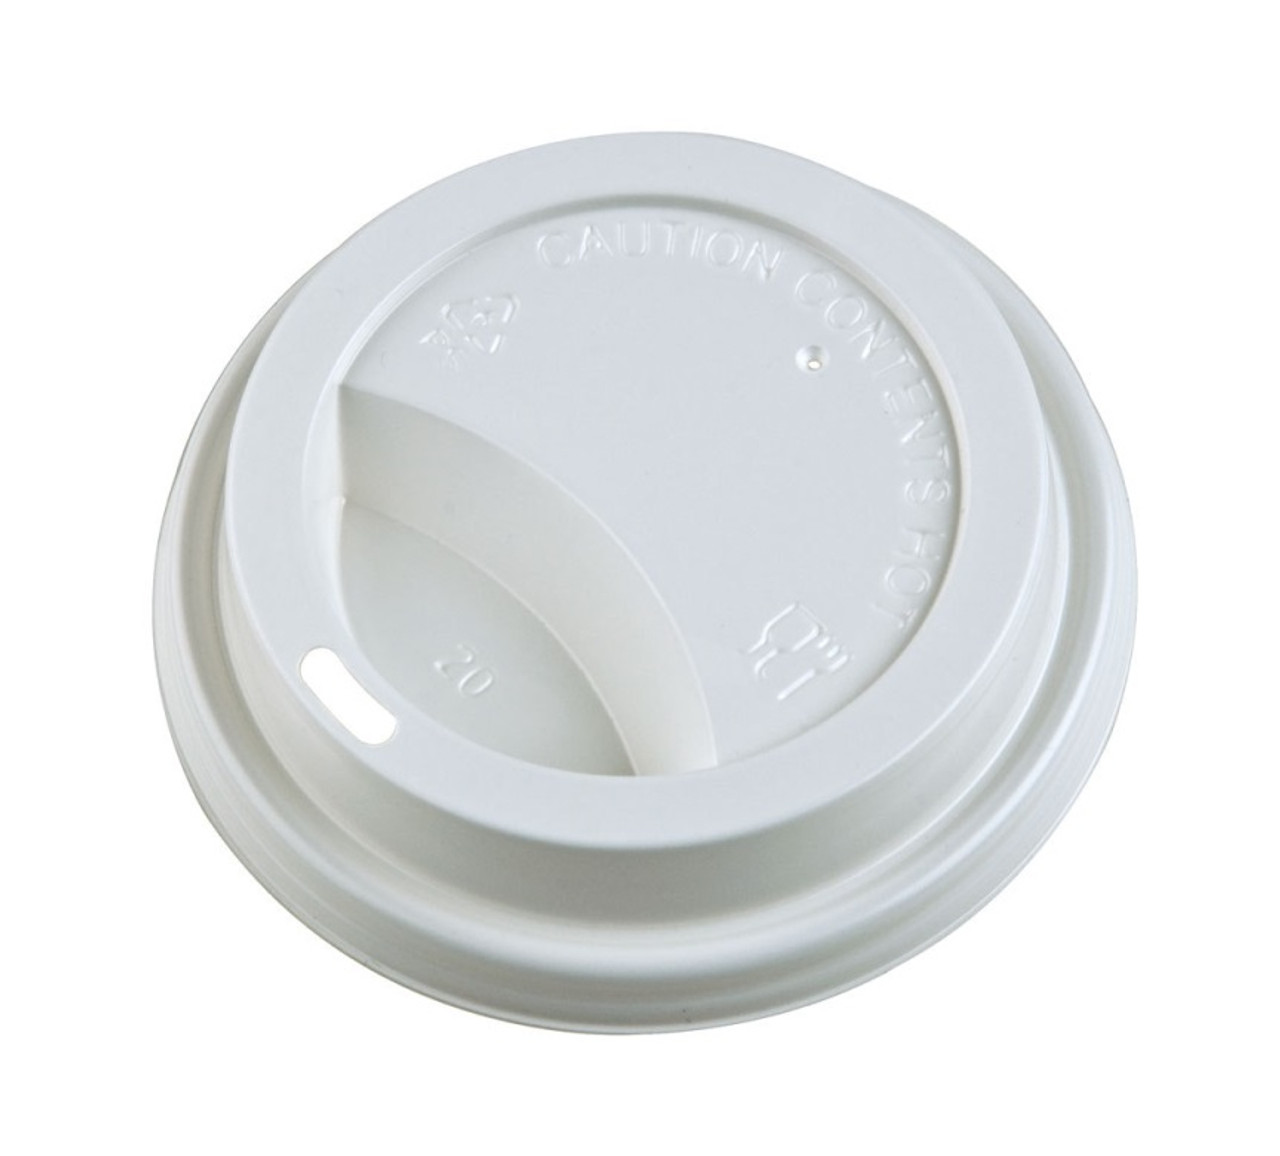 Hot Cup Lids - White - 8oz